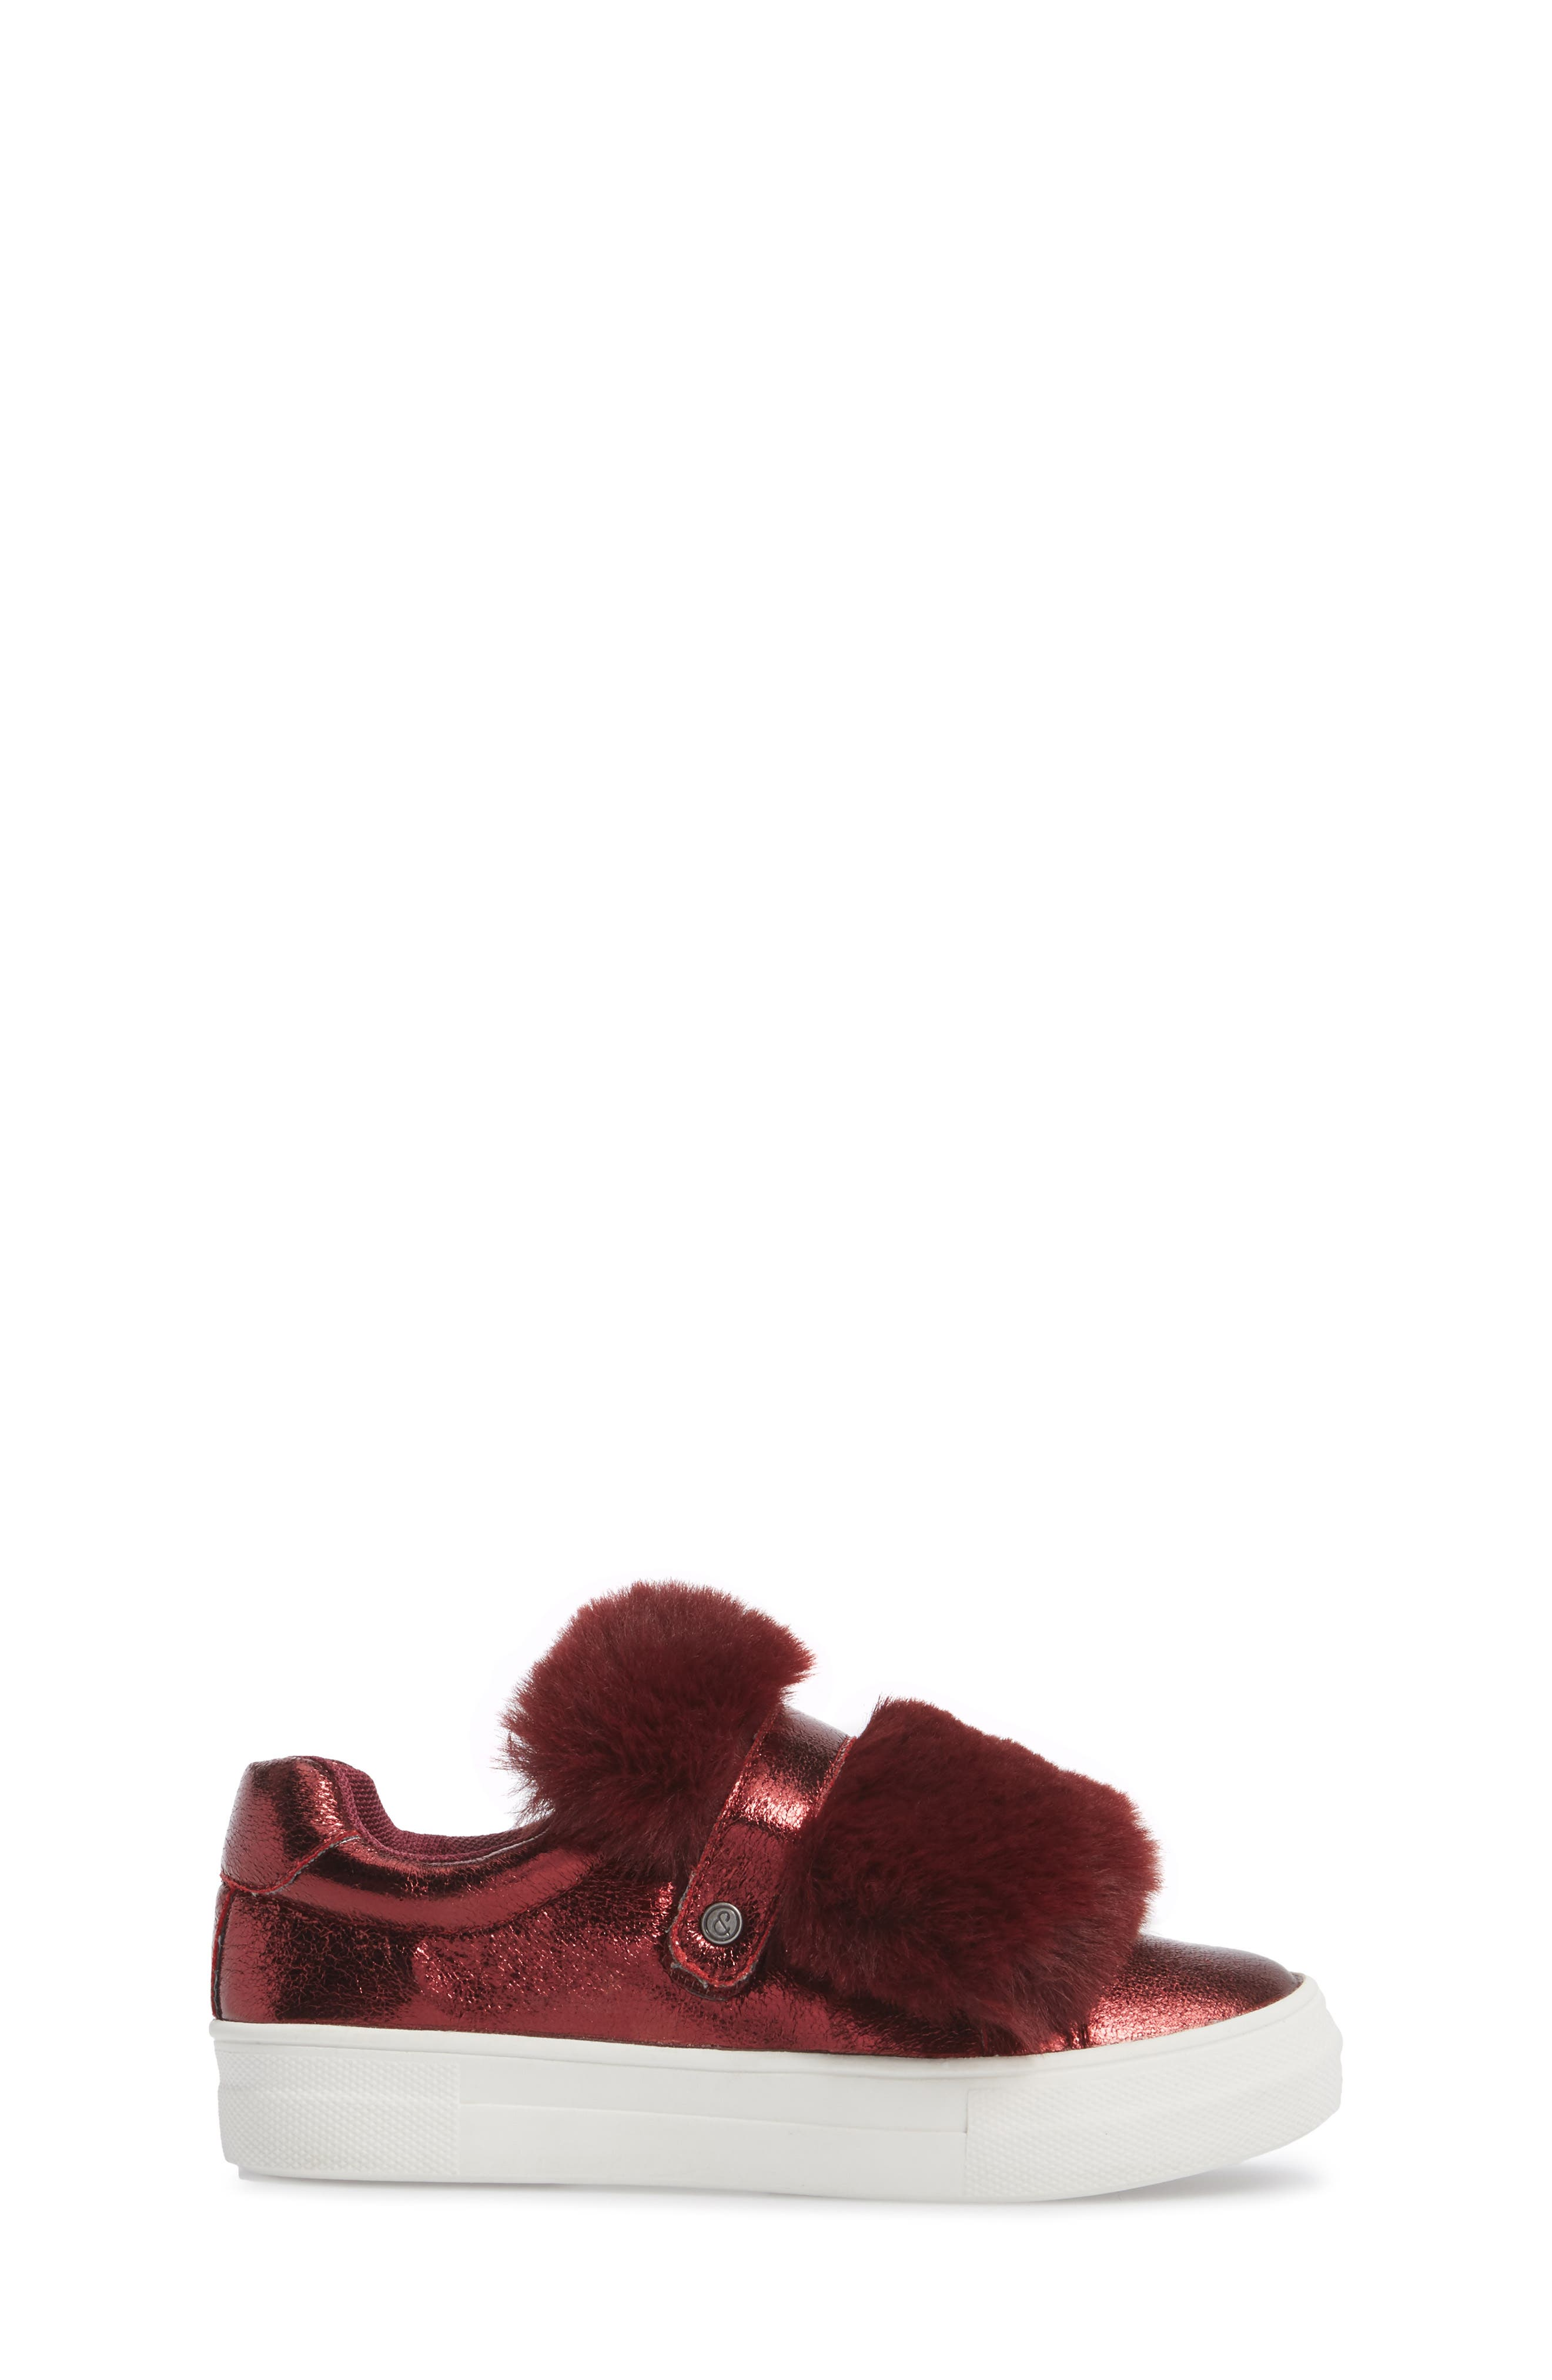 Zandra Faux Fur Metallic Sneaker,                             Alternate thumbnail 3, color,                             930